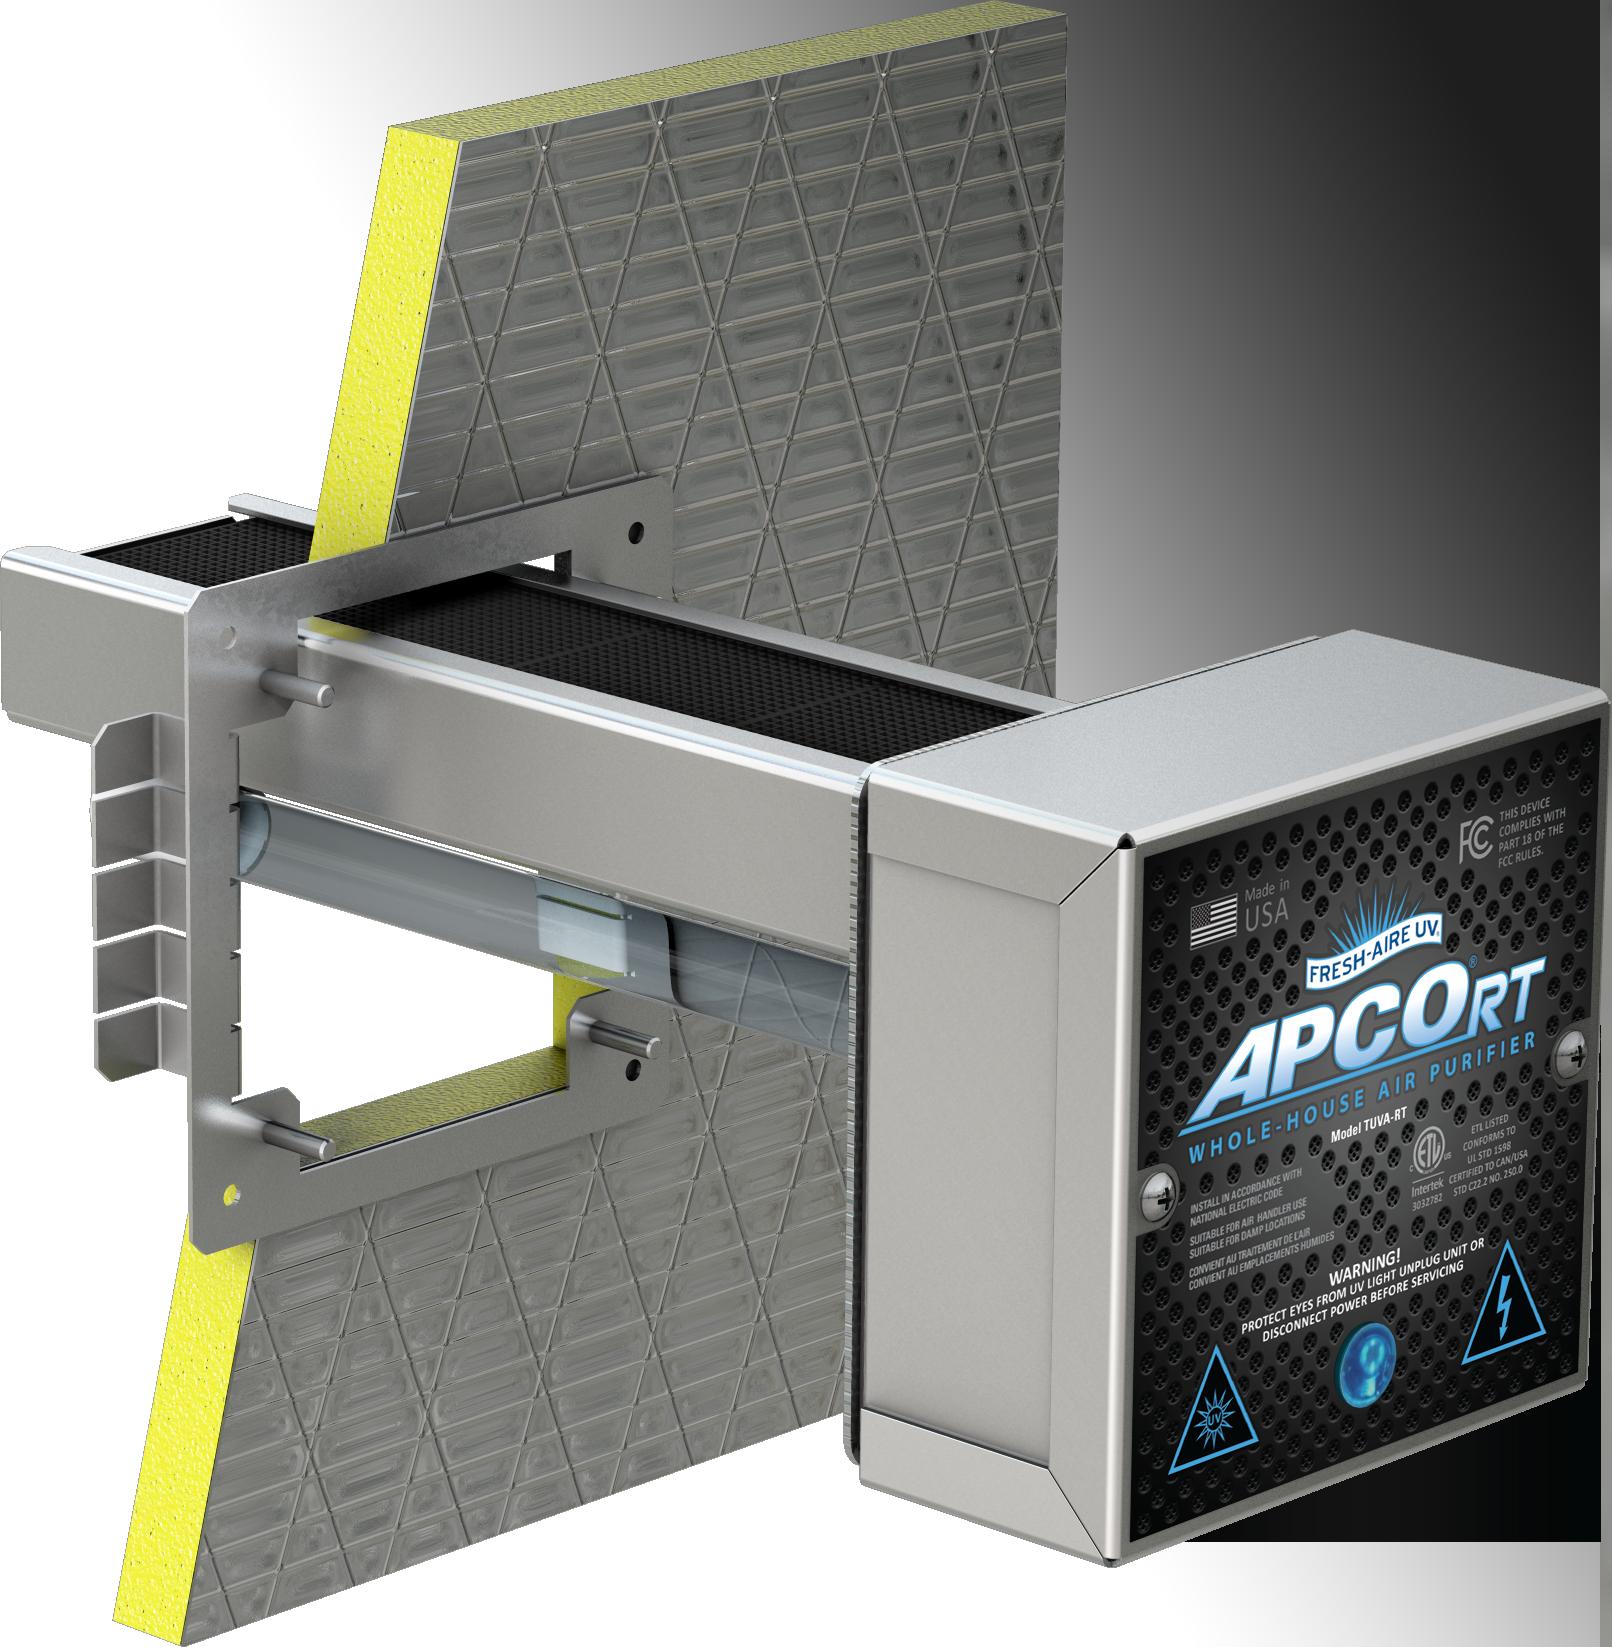 APCO RT 2 duct mount